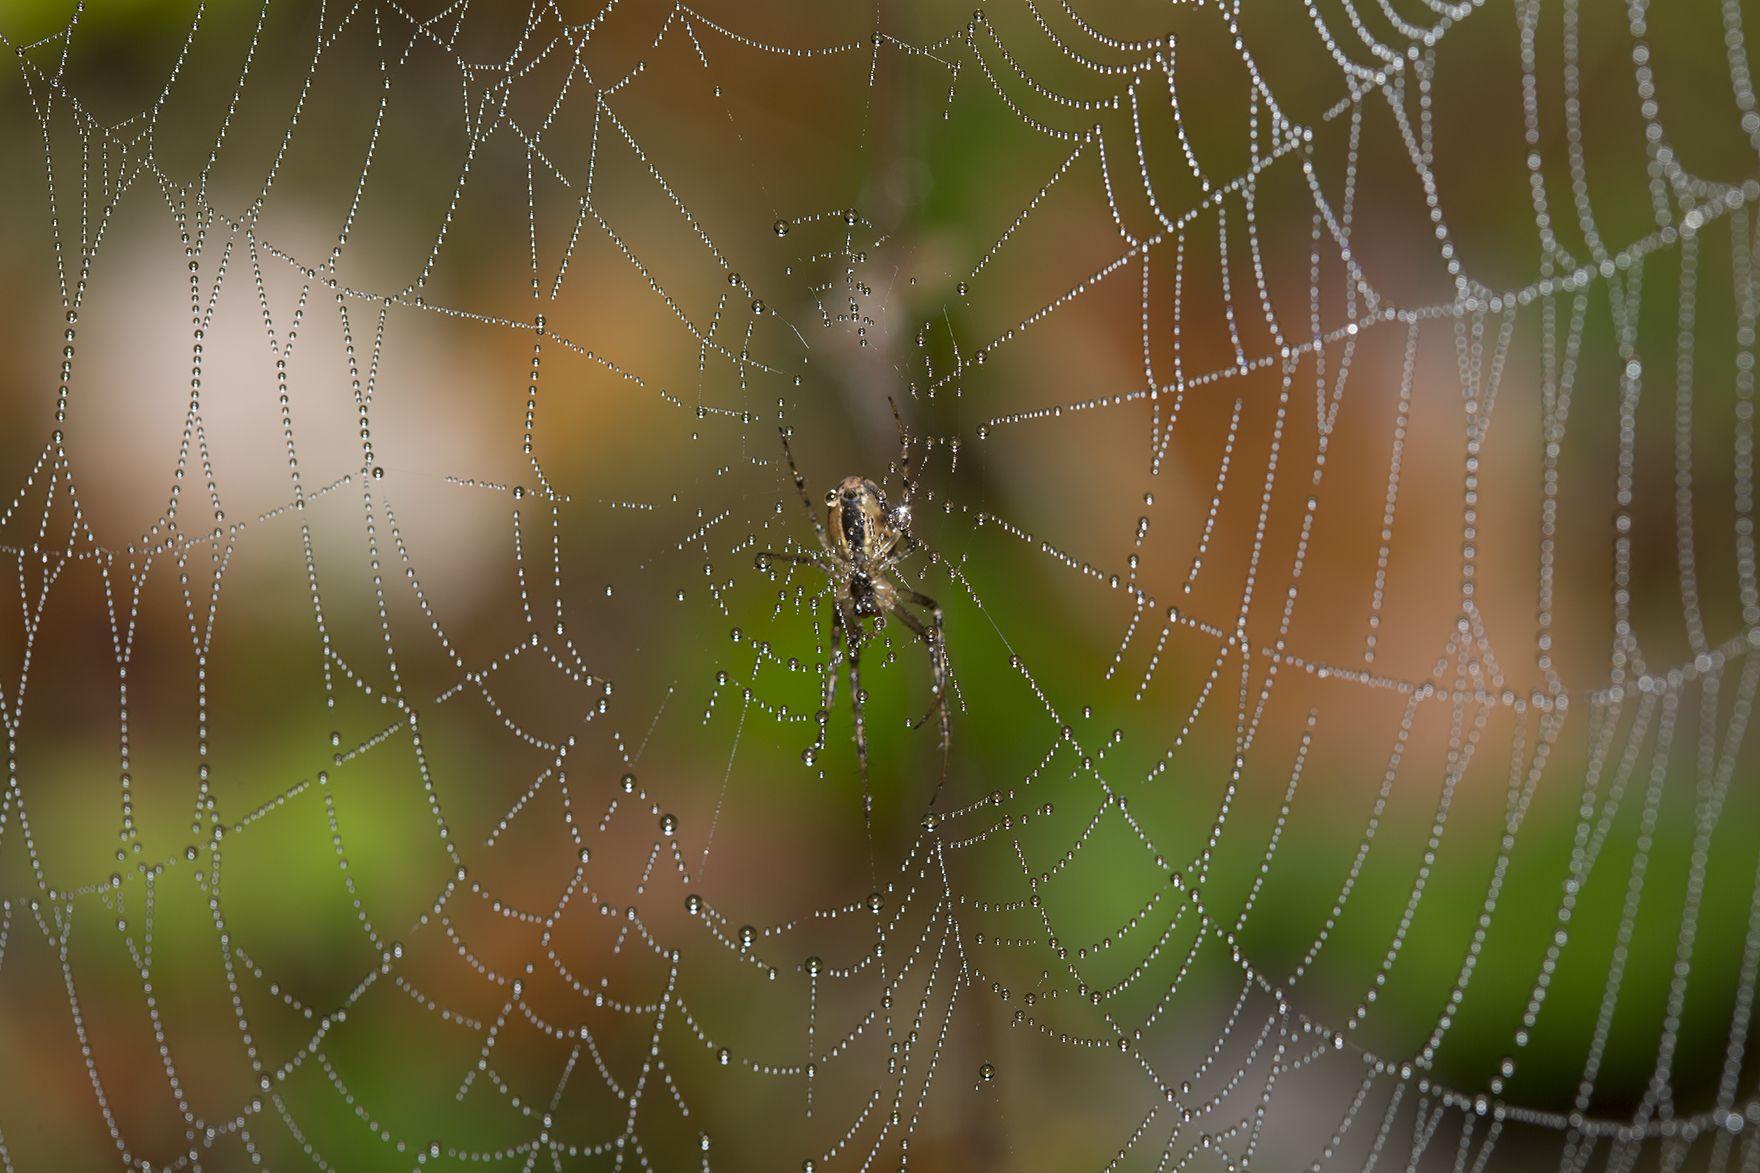 Spinnwebe im Herbst